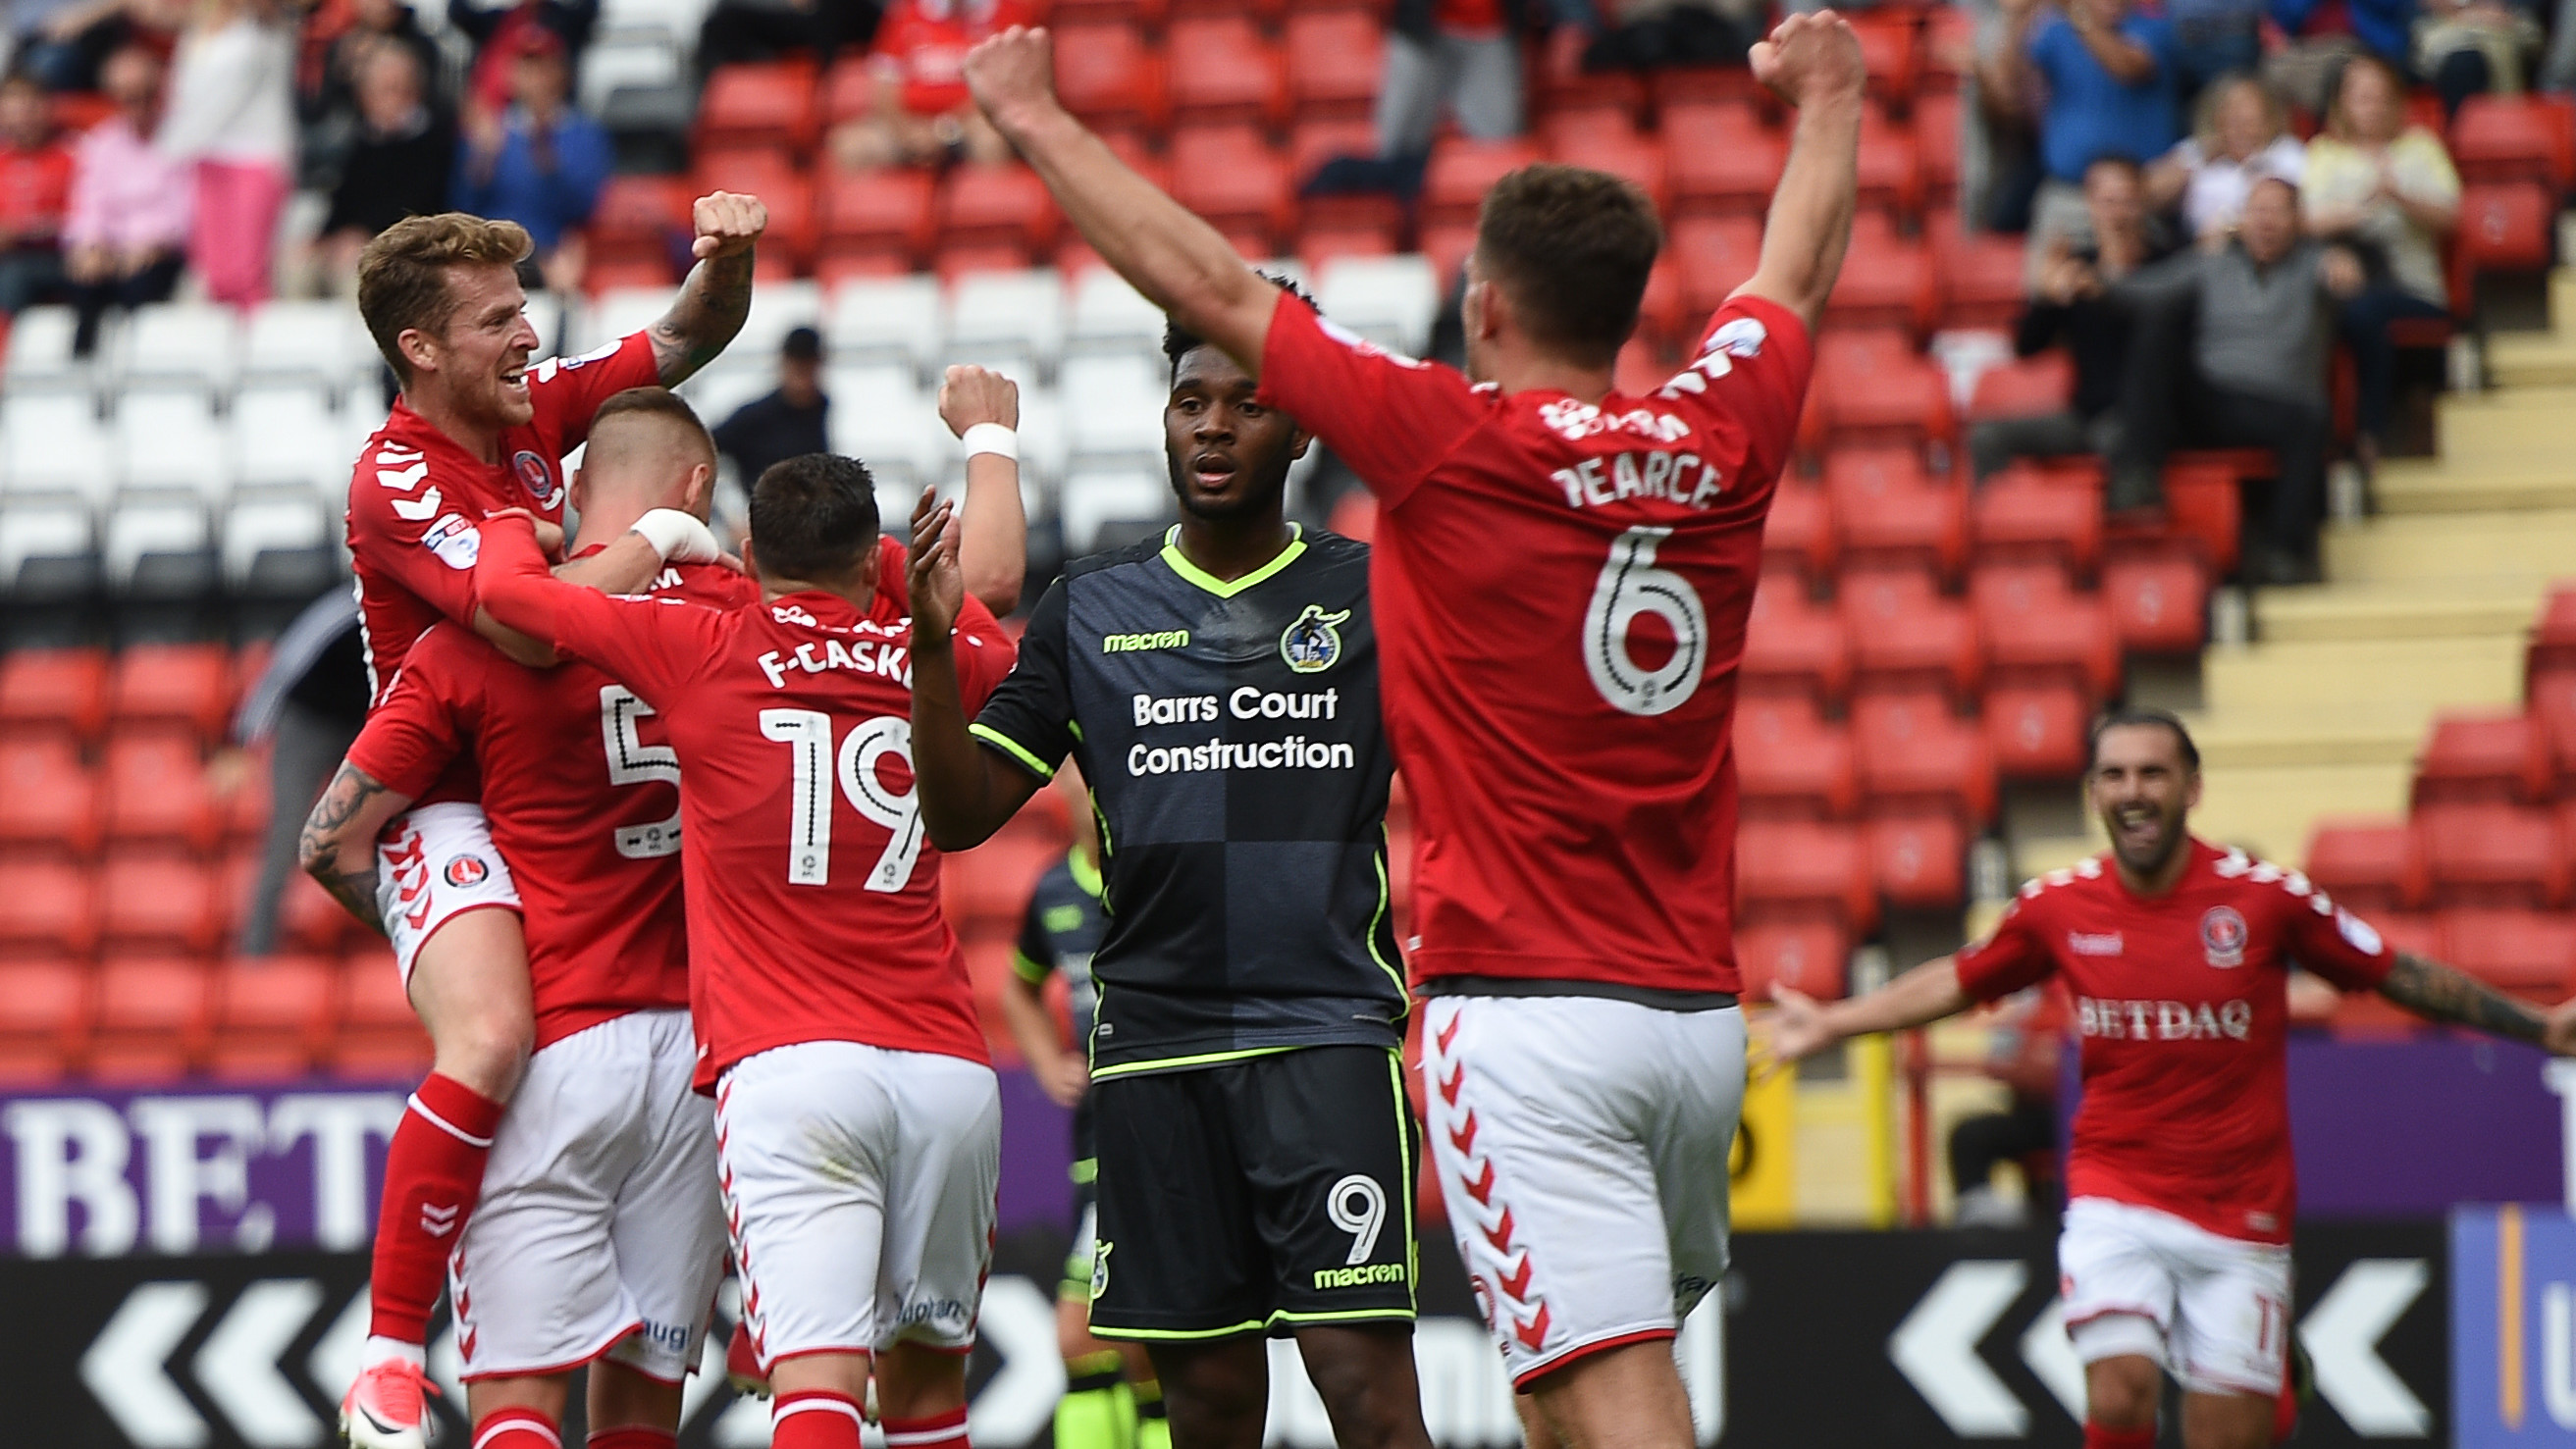 Bristol Rovers vs Charlton Prediction – SportPesa Mega Jackpot Predictions This Weekend